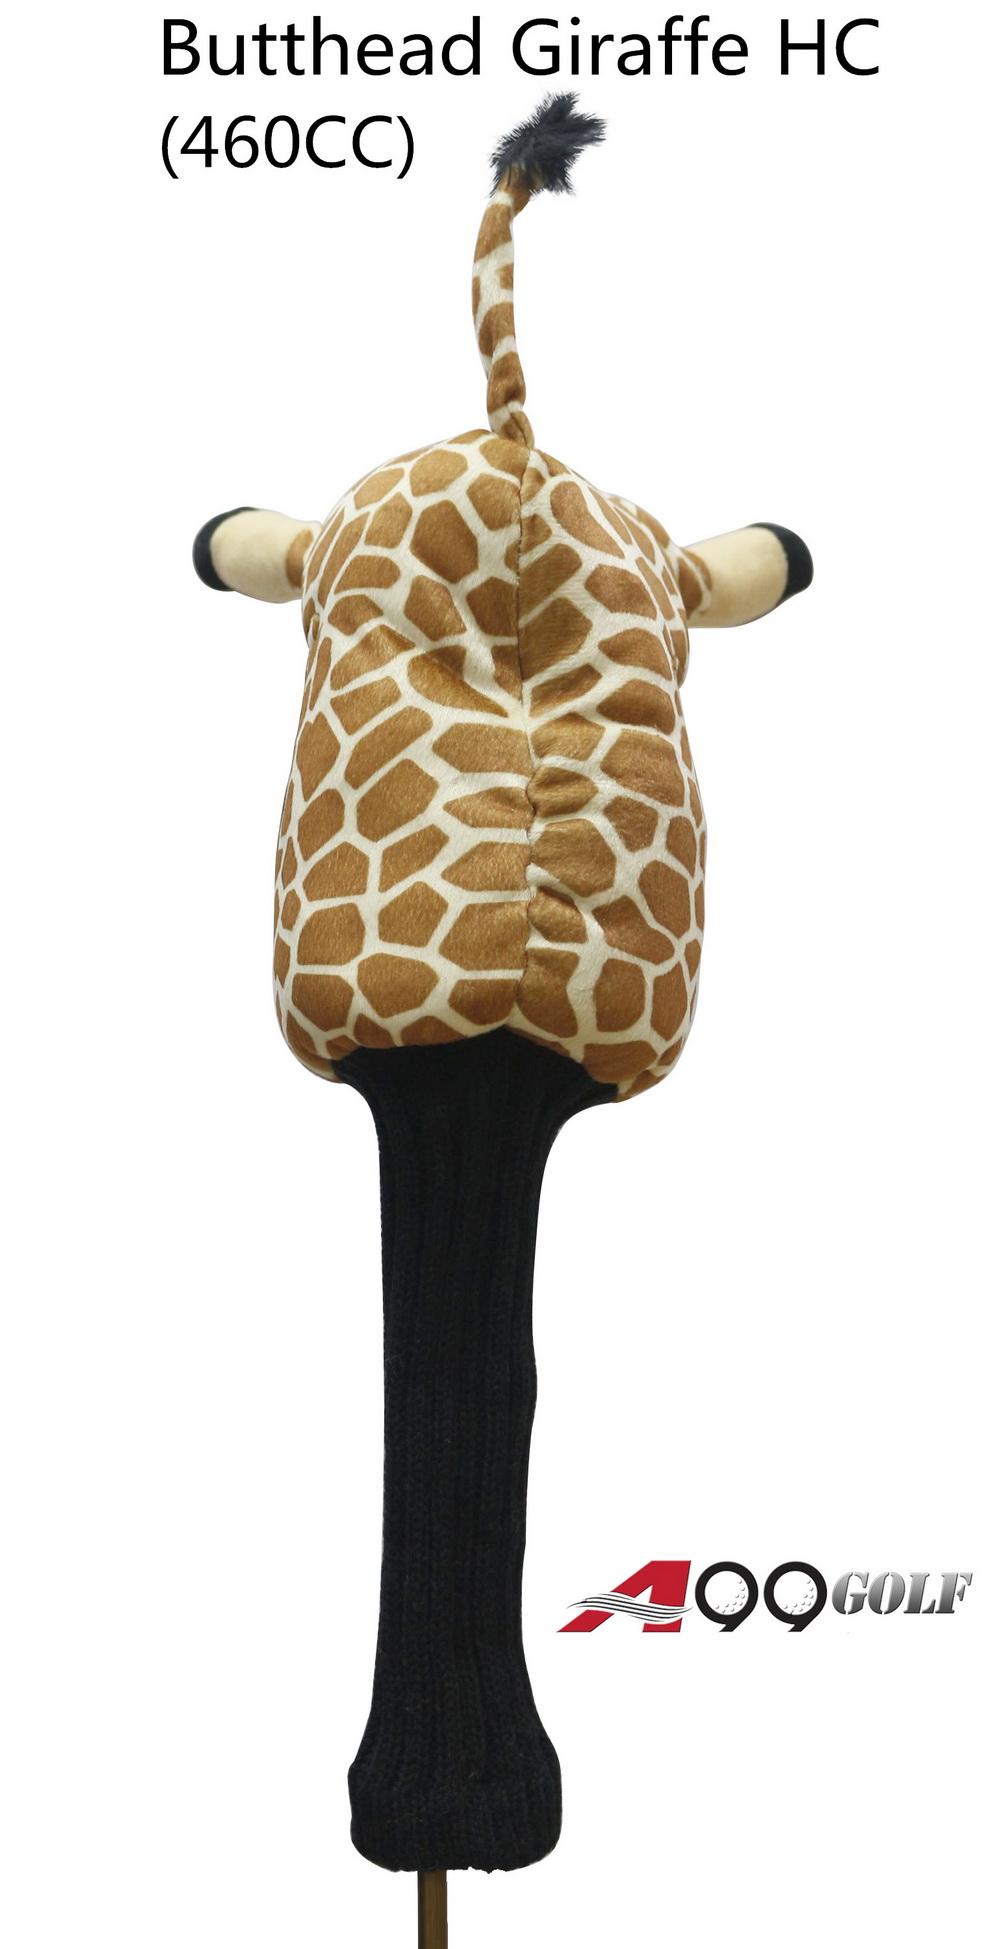 Butthead-Giraffe-Head-Cover.jpg